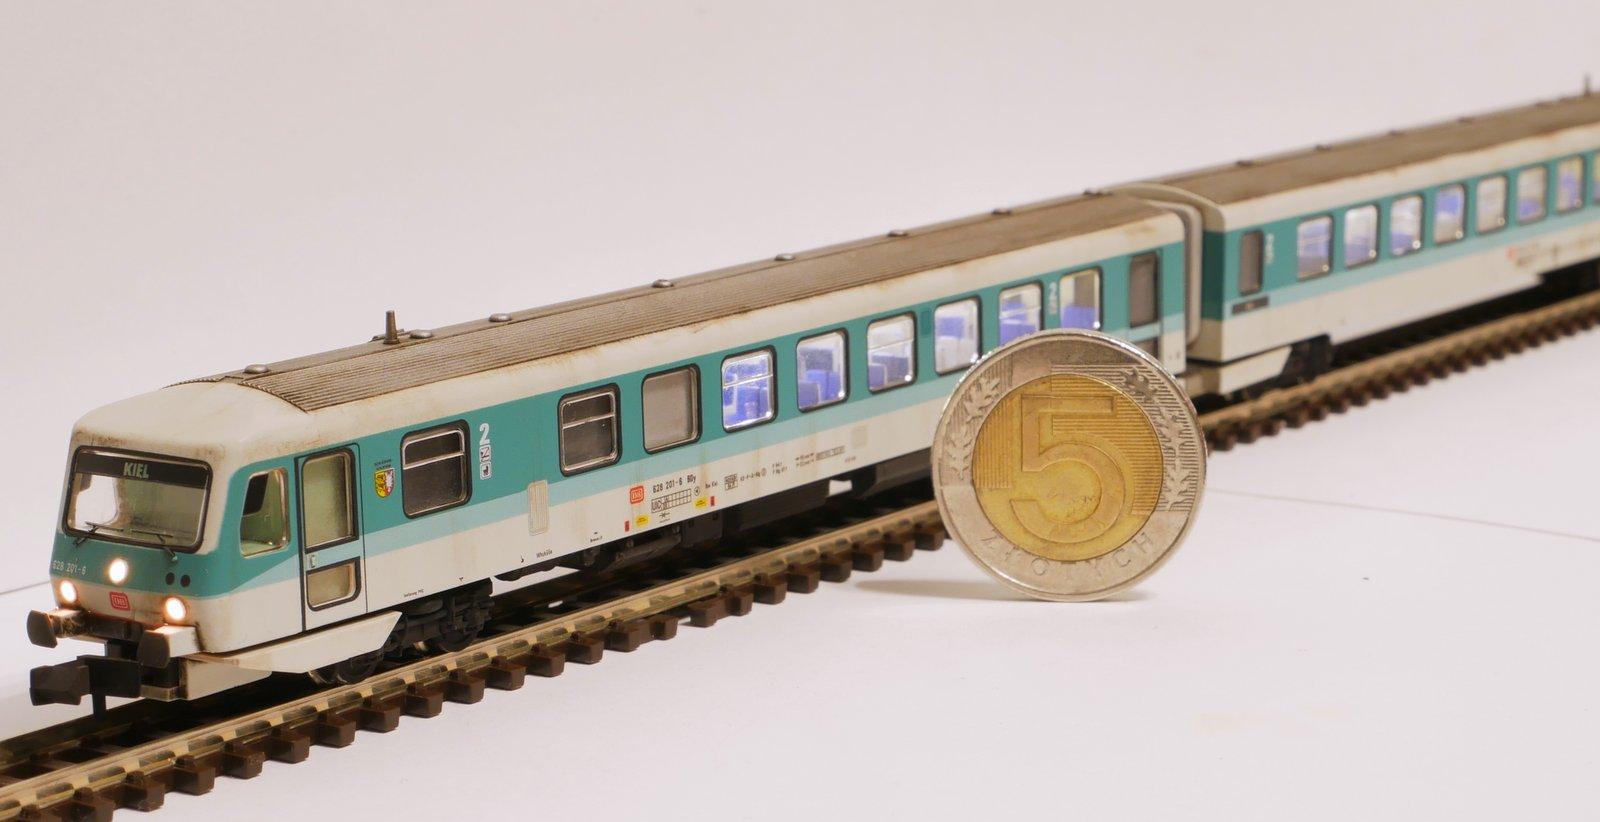 P1140784-001.JPG